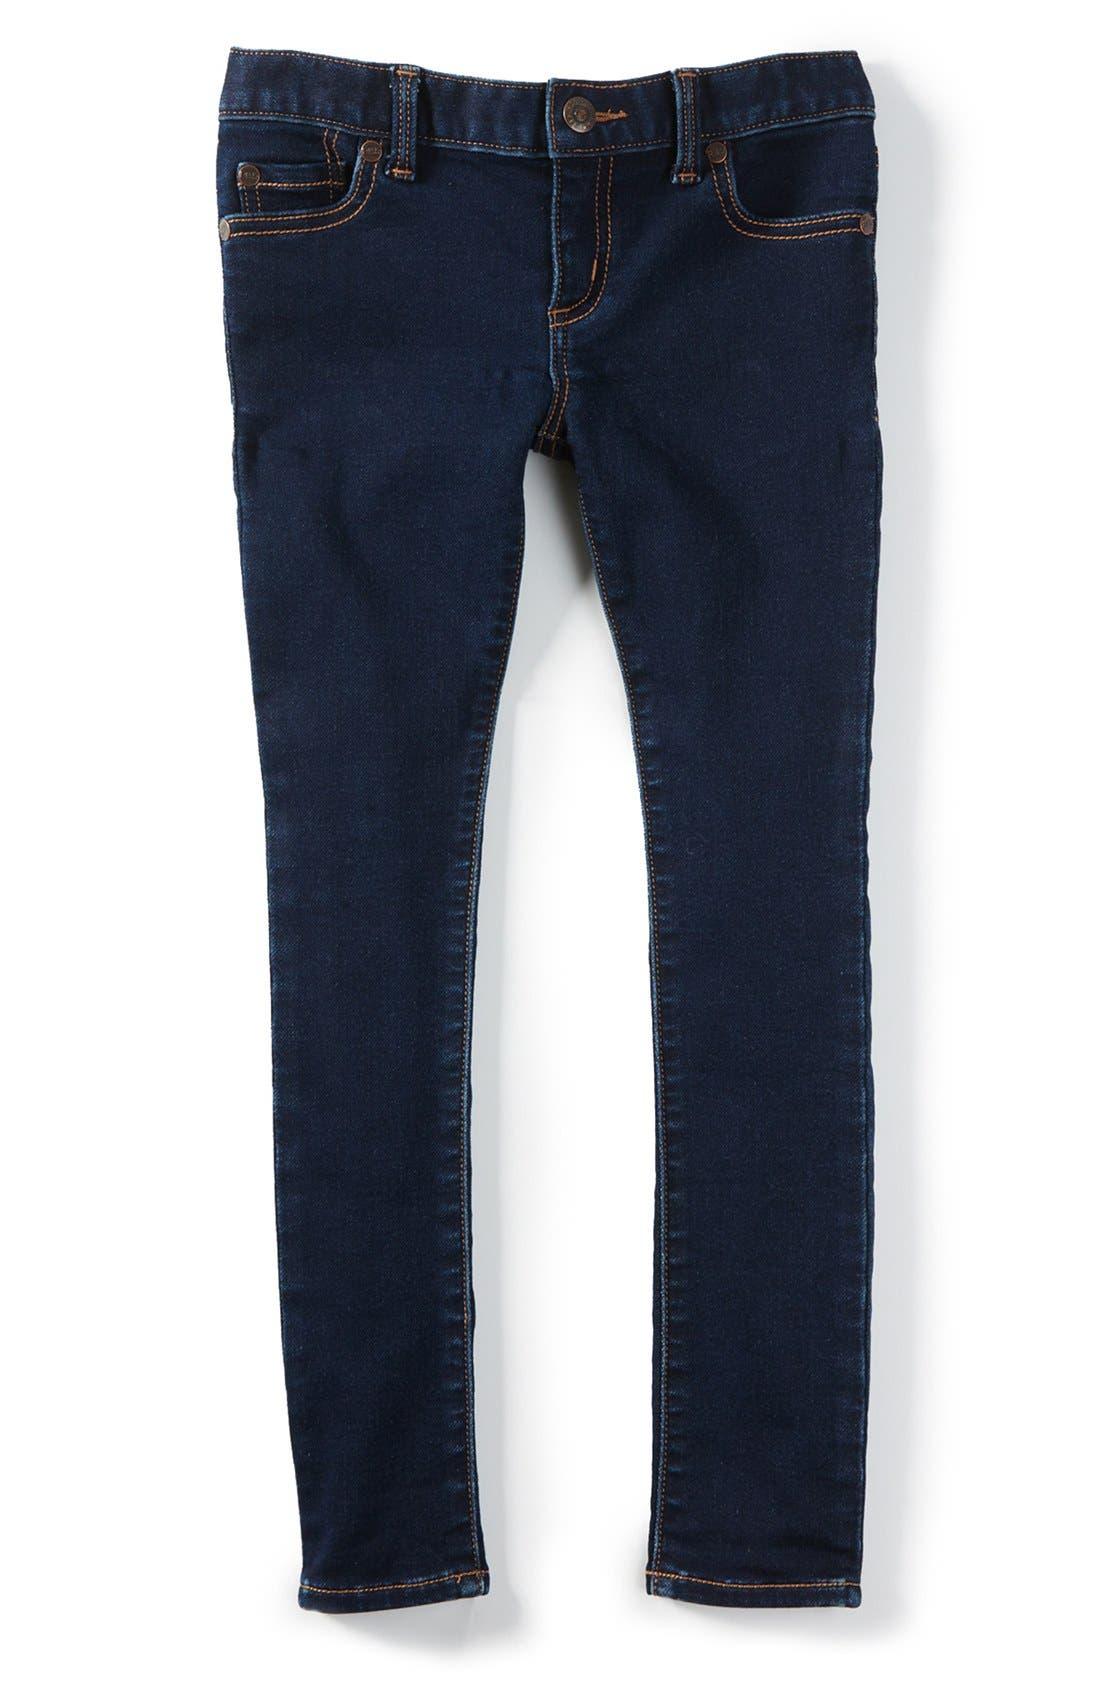 Peek 'Taylor' Skinny Jeans, Main, color, 463